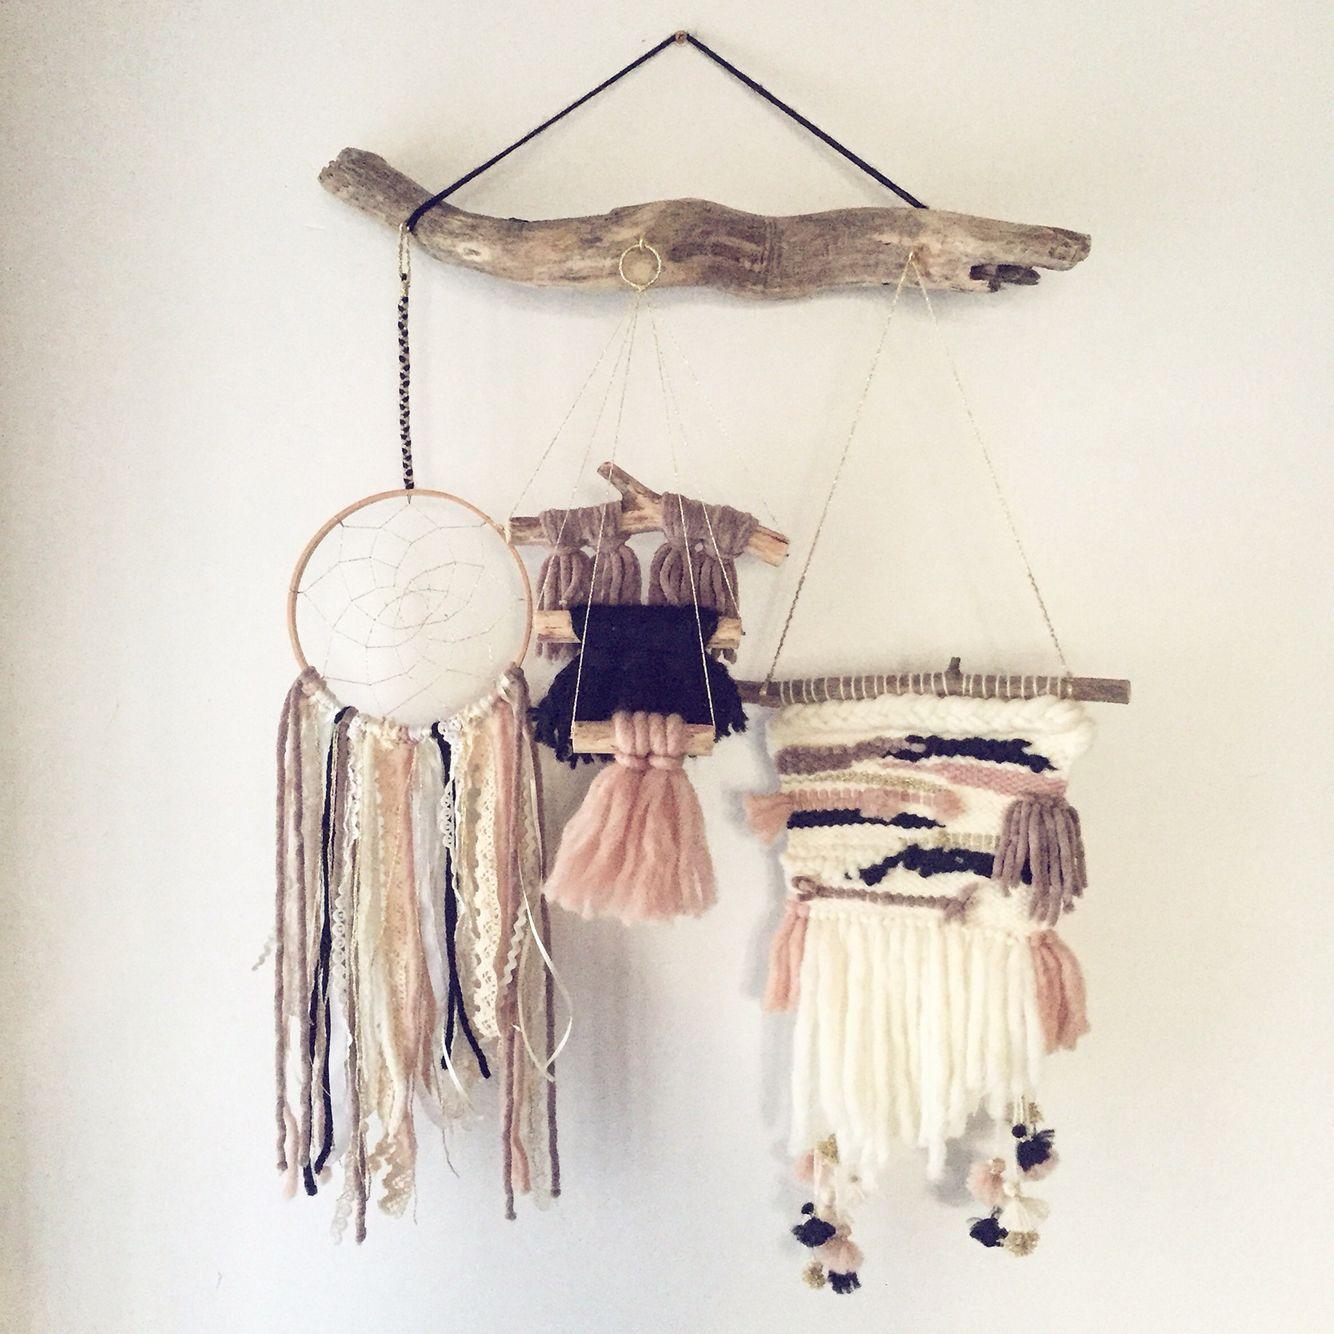 tissage laine attrape r ves et bois flott ma cr a wall hanging weaving macrame loom. Black Bedroom Furniture Sets. Home Design Ideas